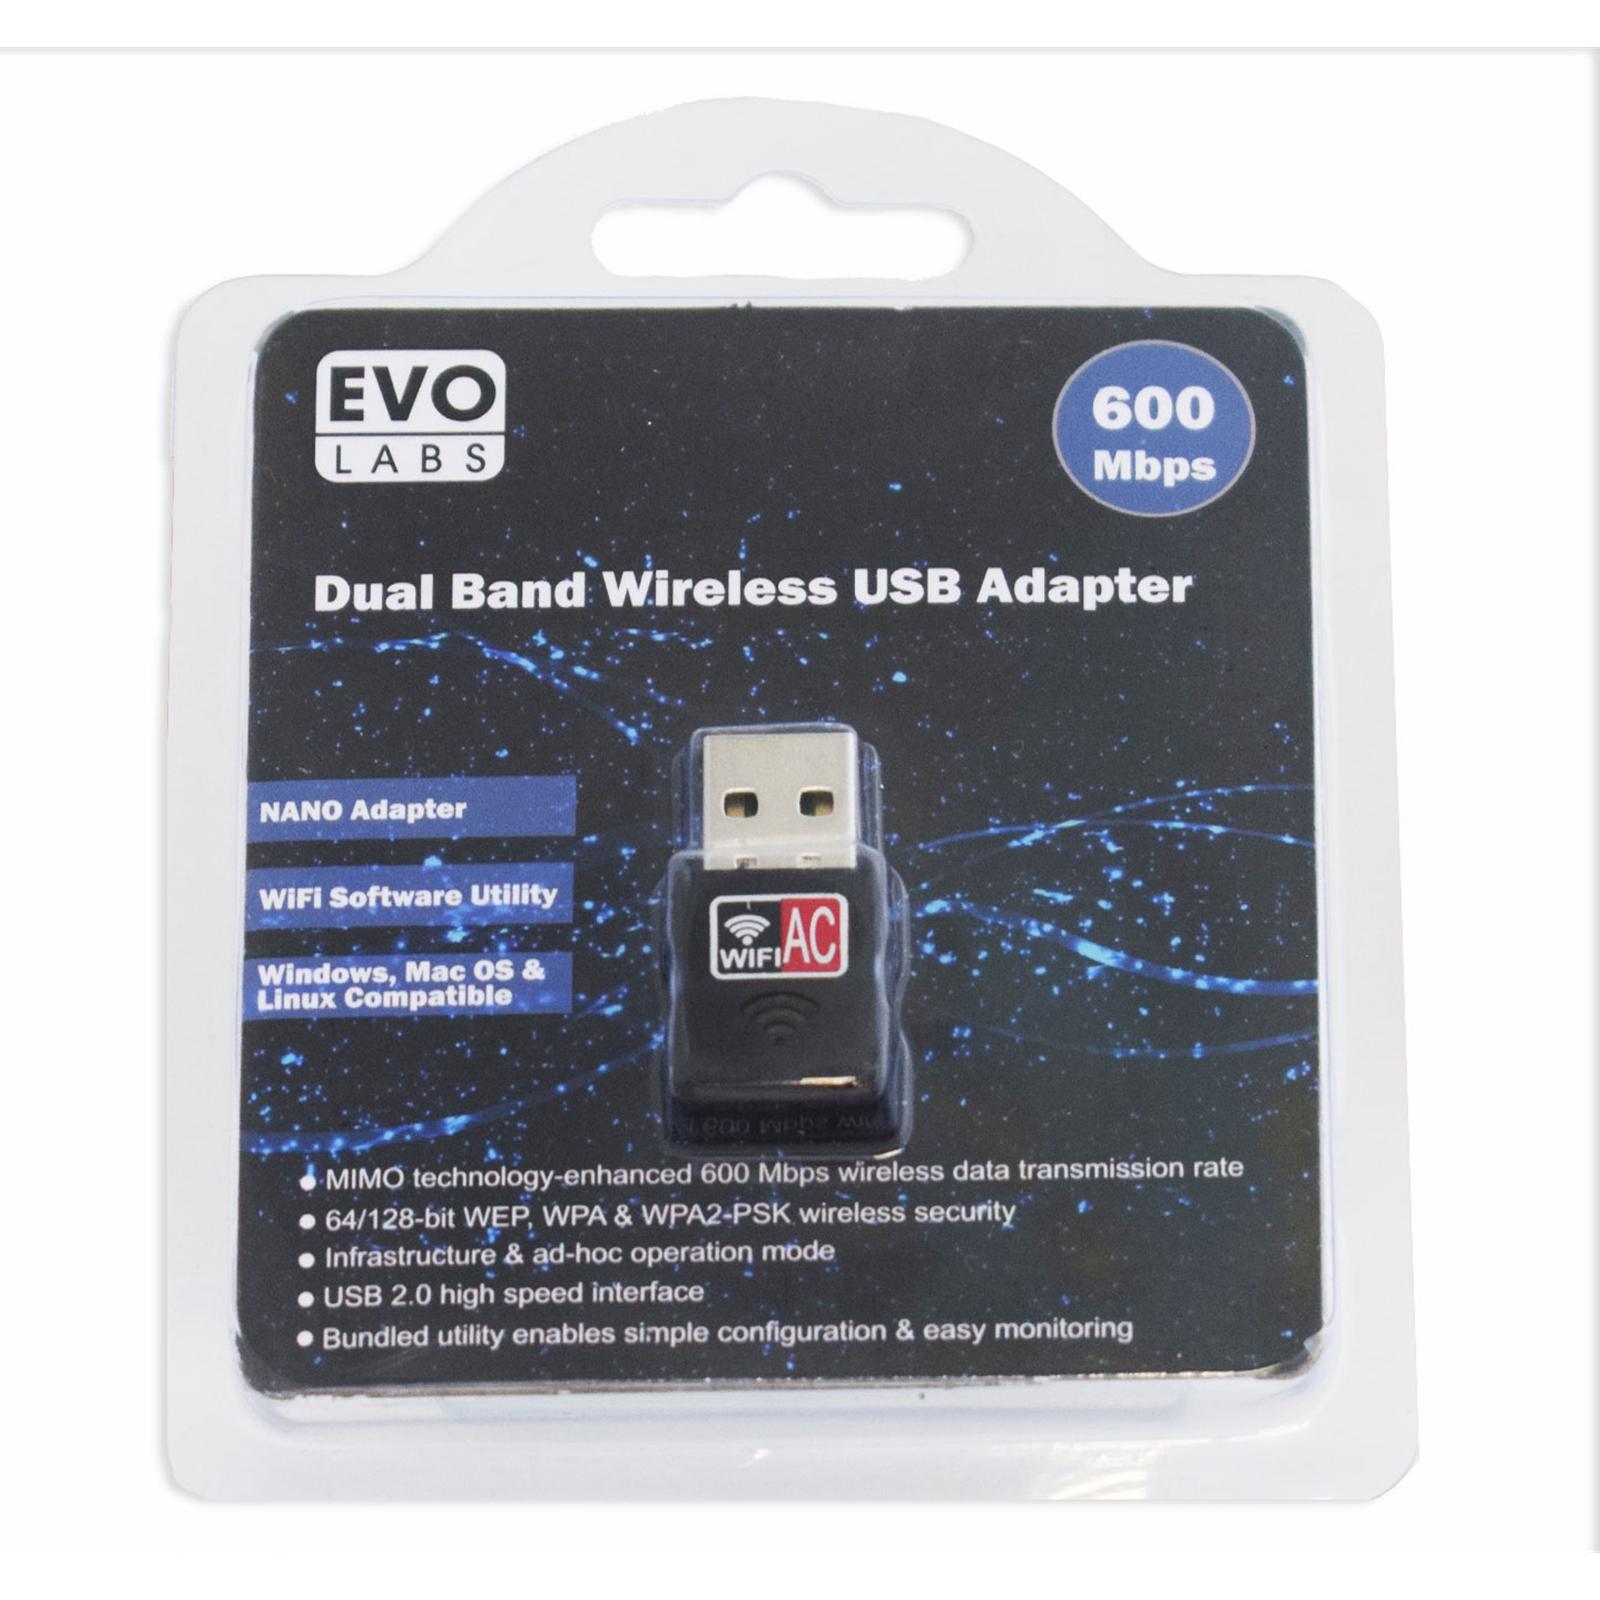 Evo Labs AC600 Dual Band USB WiFi Network Adapter